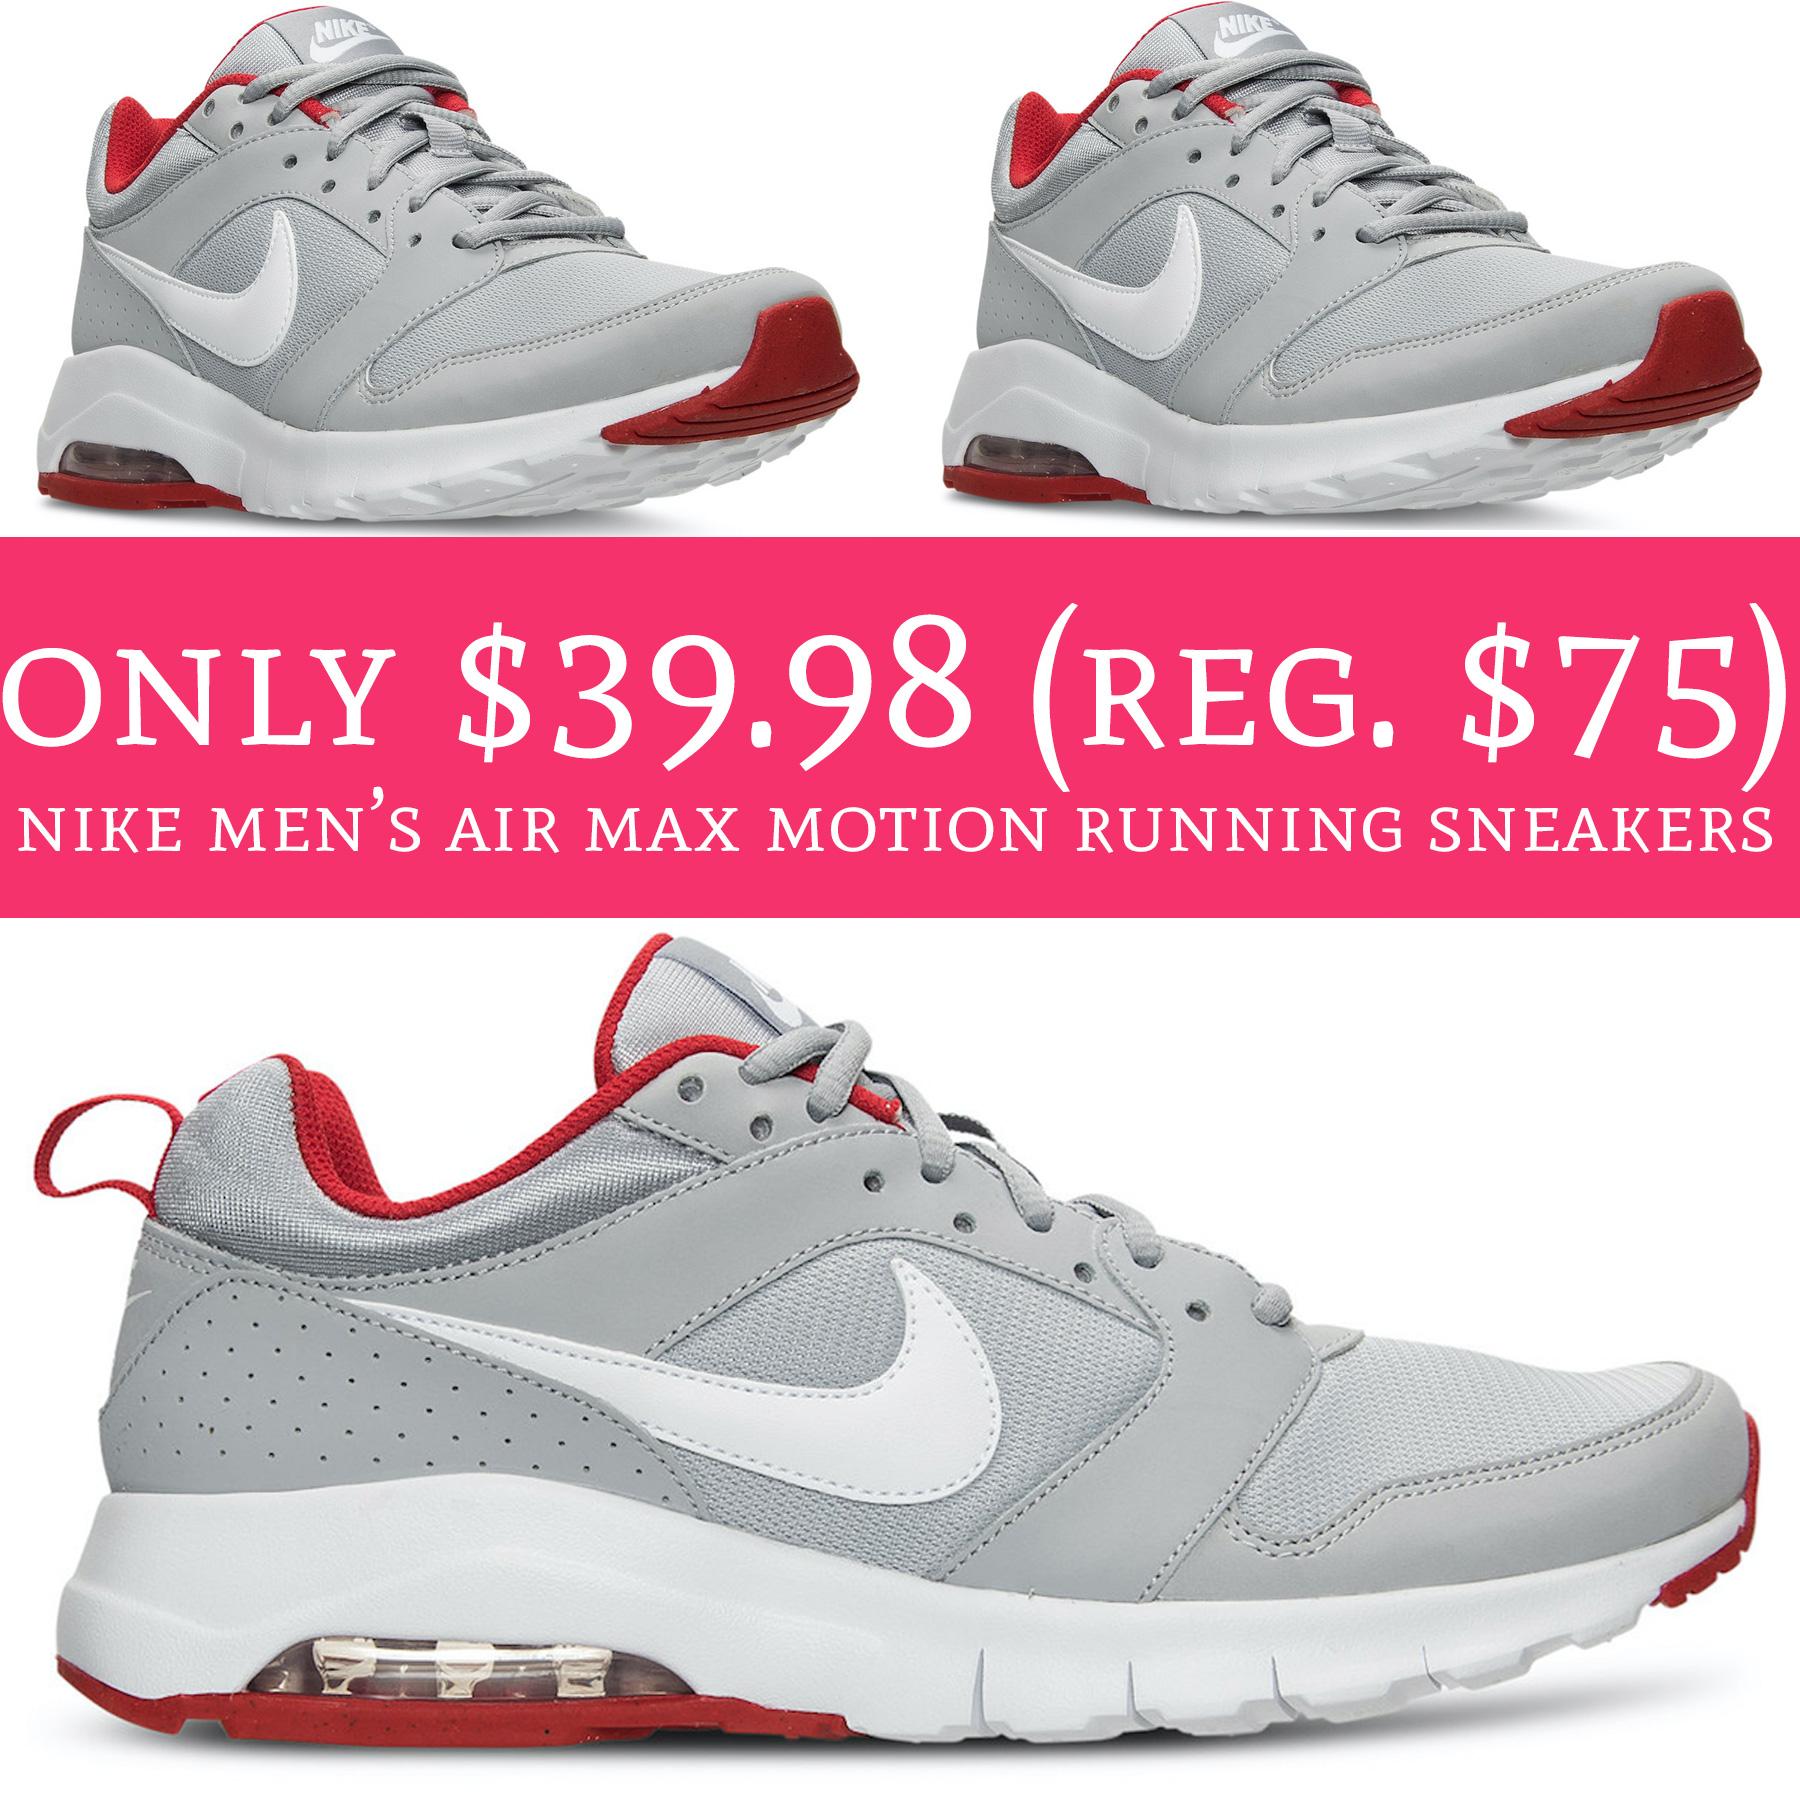 664b8257a1157c Only  39.98 (Regular  75) Nike Men s Air Max Motion Running Sneakers ...